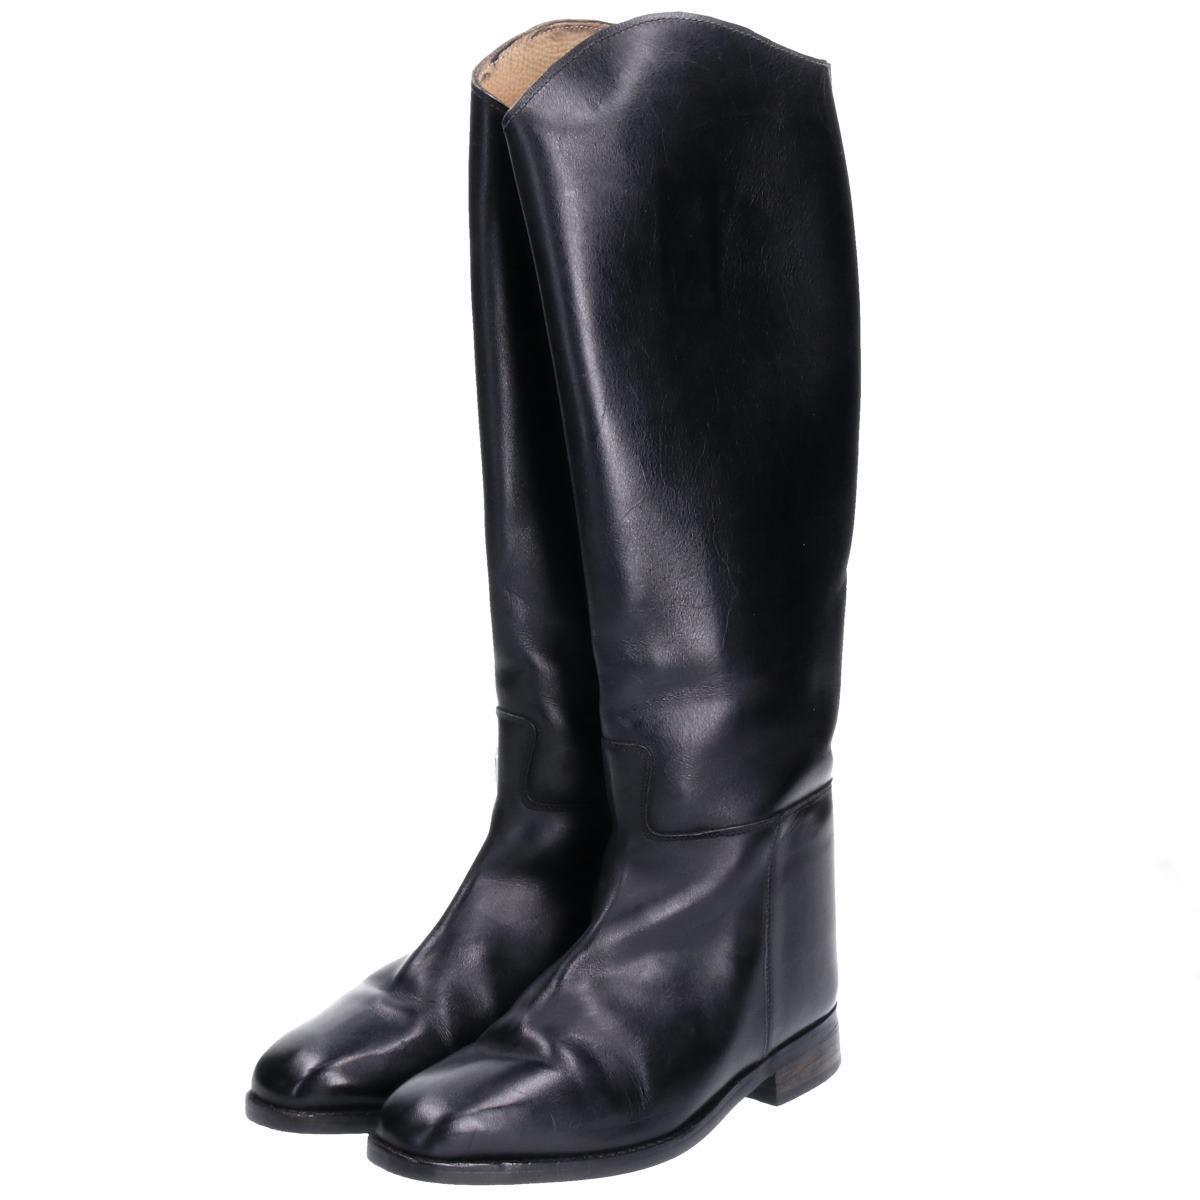 Rea ジョッキー乗馬ブーツ 39 レディース24.5cm /boq4152 【中古】 【190927】【ws2001】【CS2001】【PD2001】【【SS2003】】